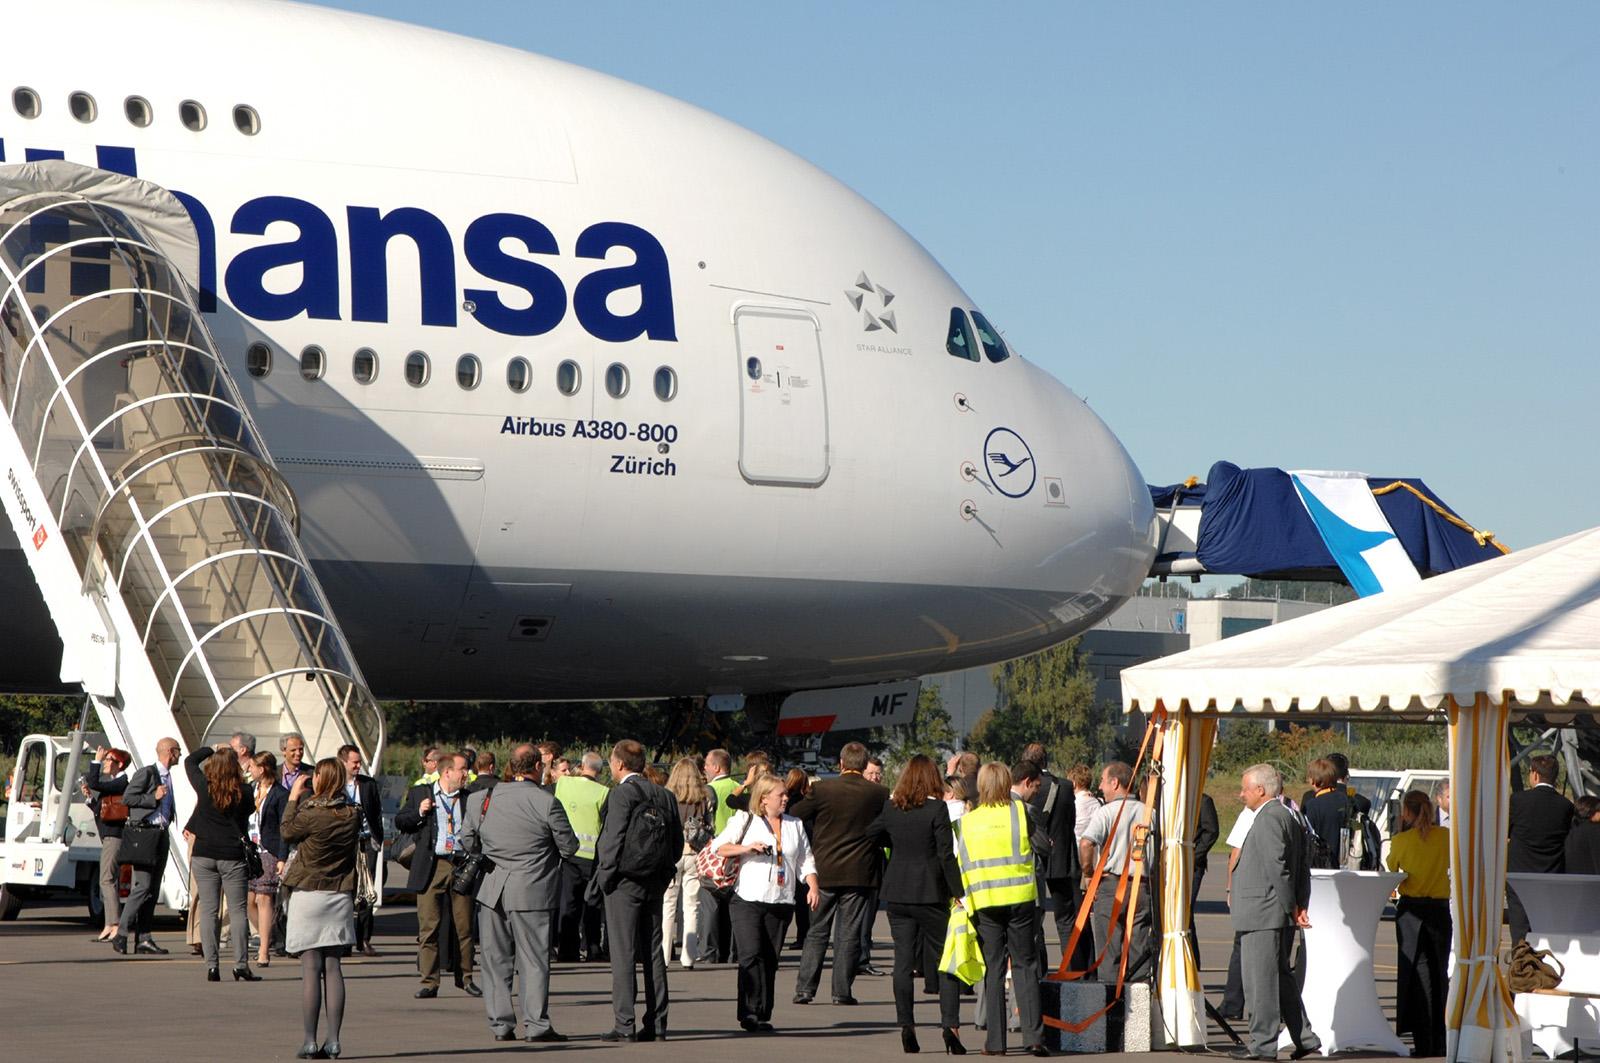 Lufthansa names Airbus A380 after Zurich